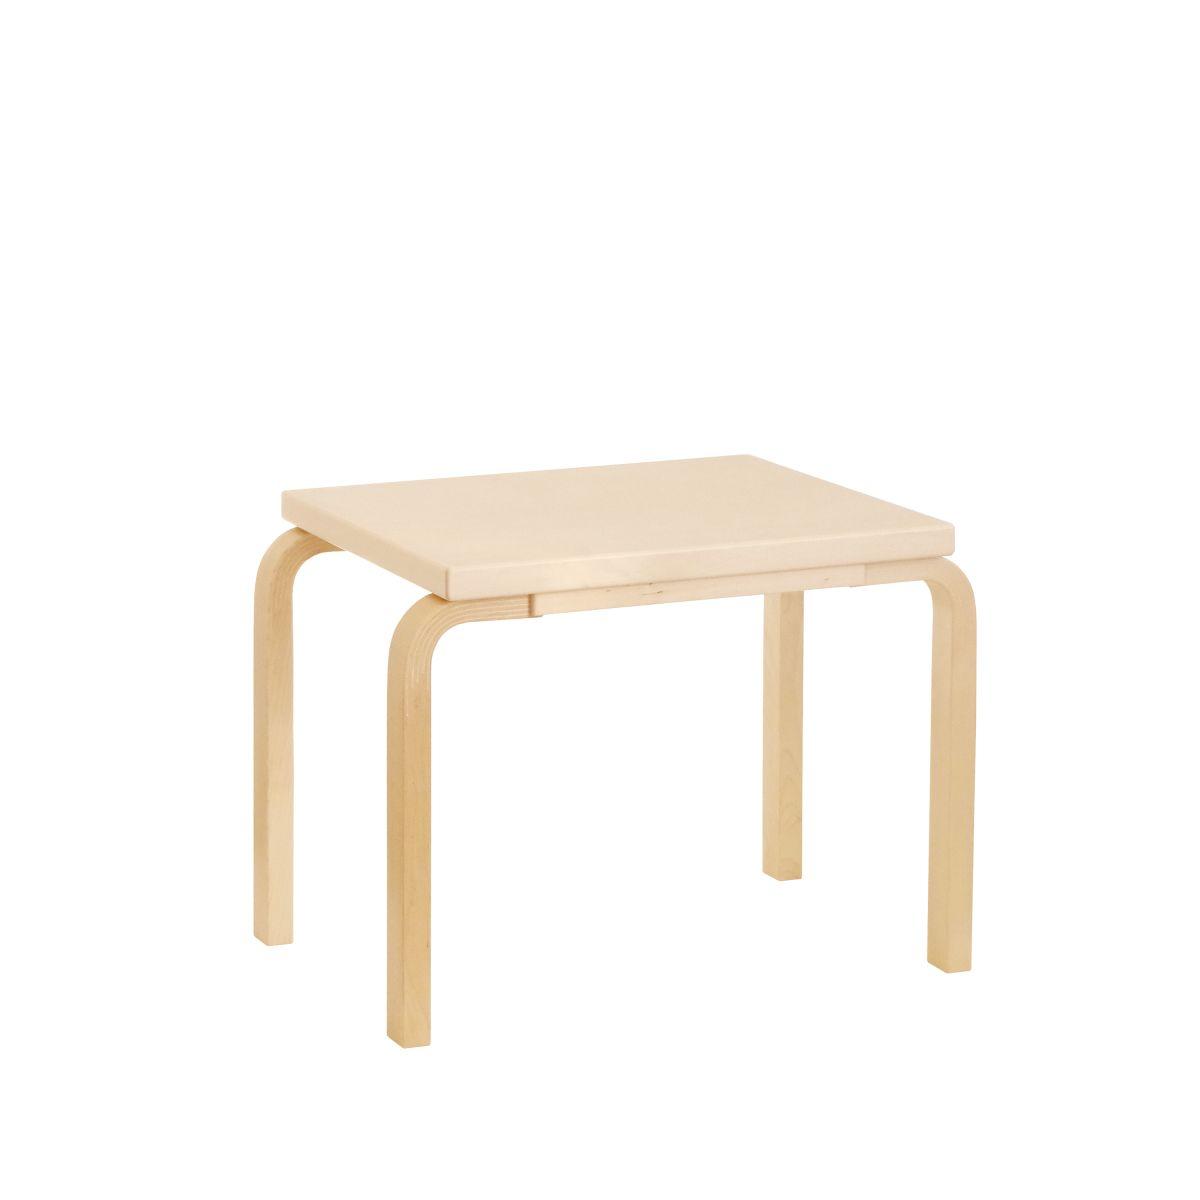 Nesting-table-88C-2995777